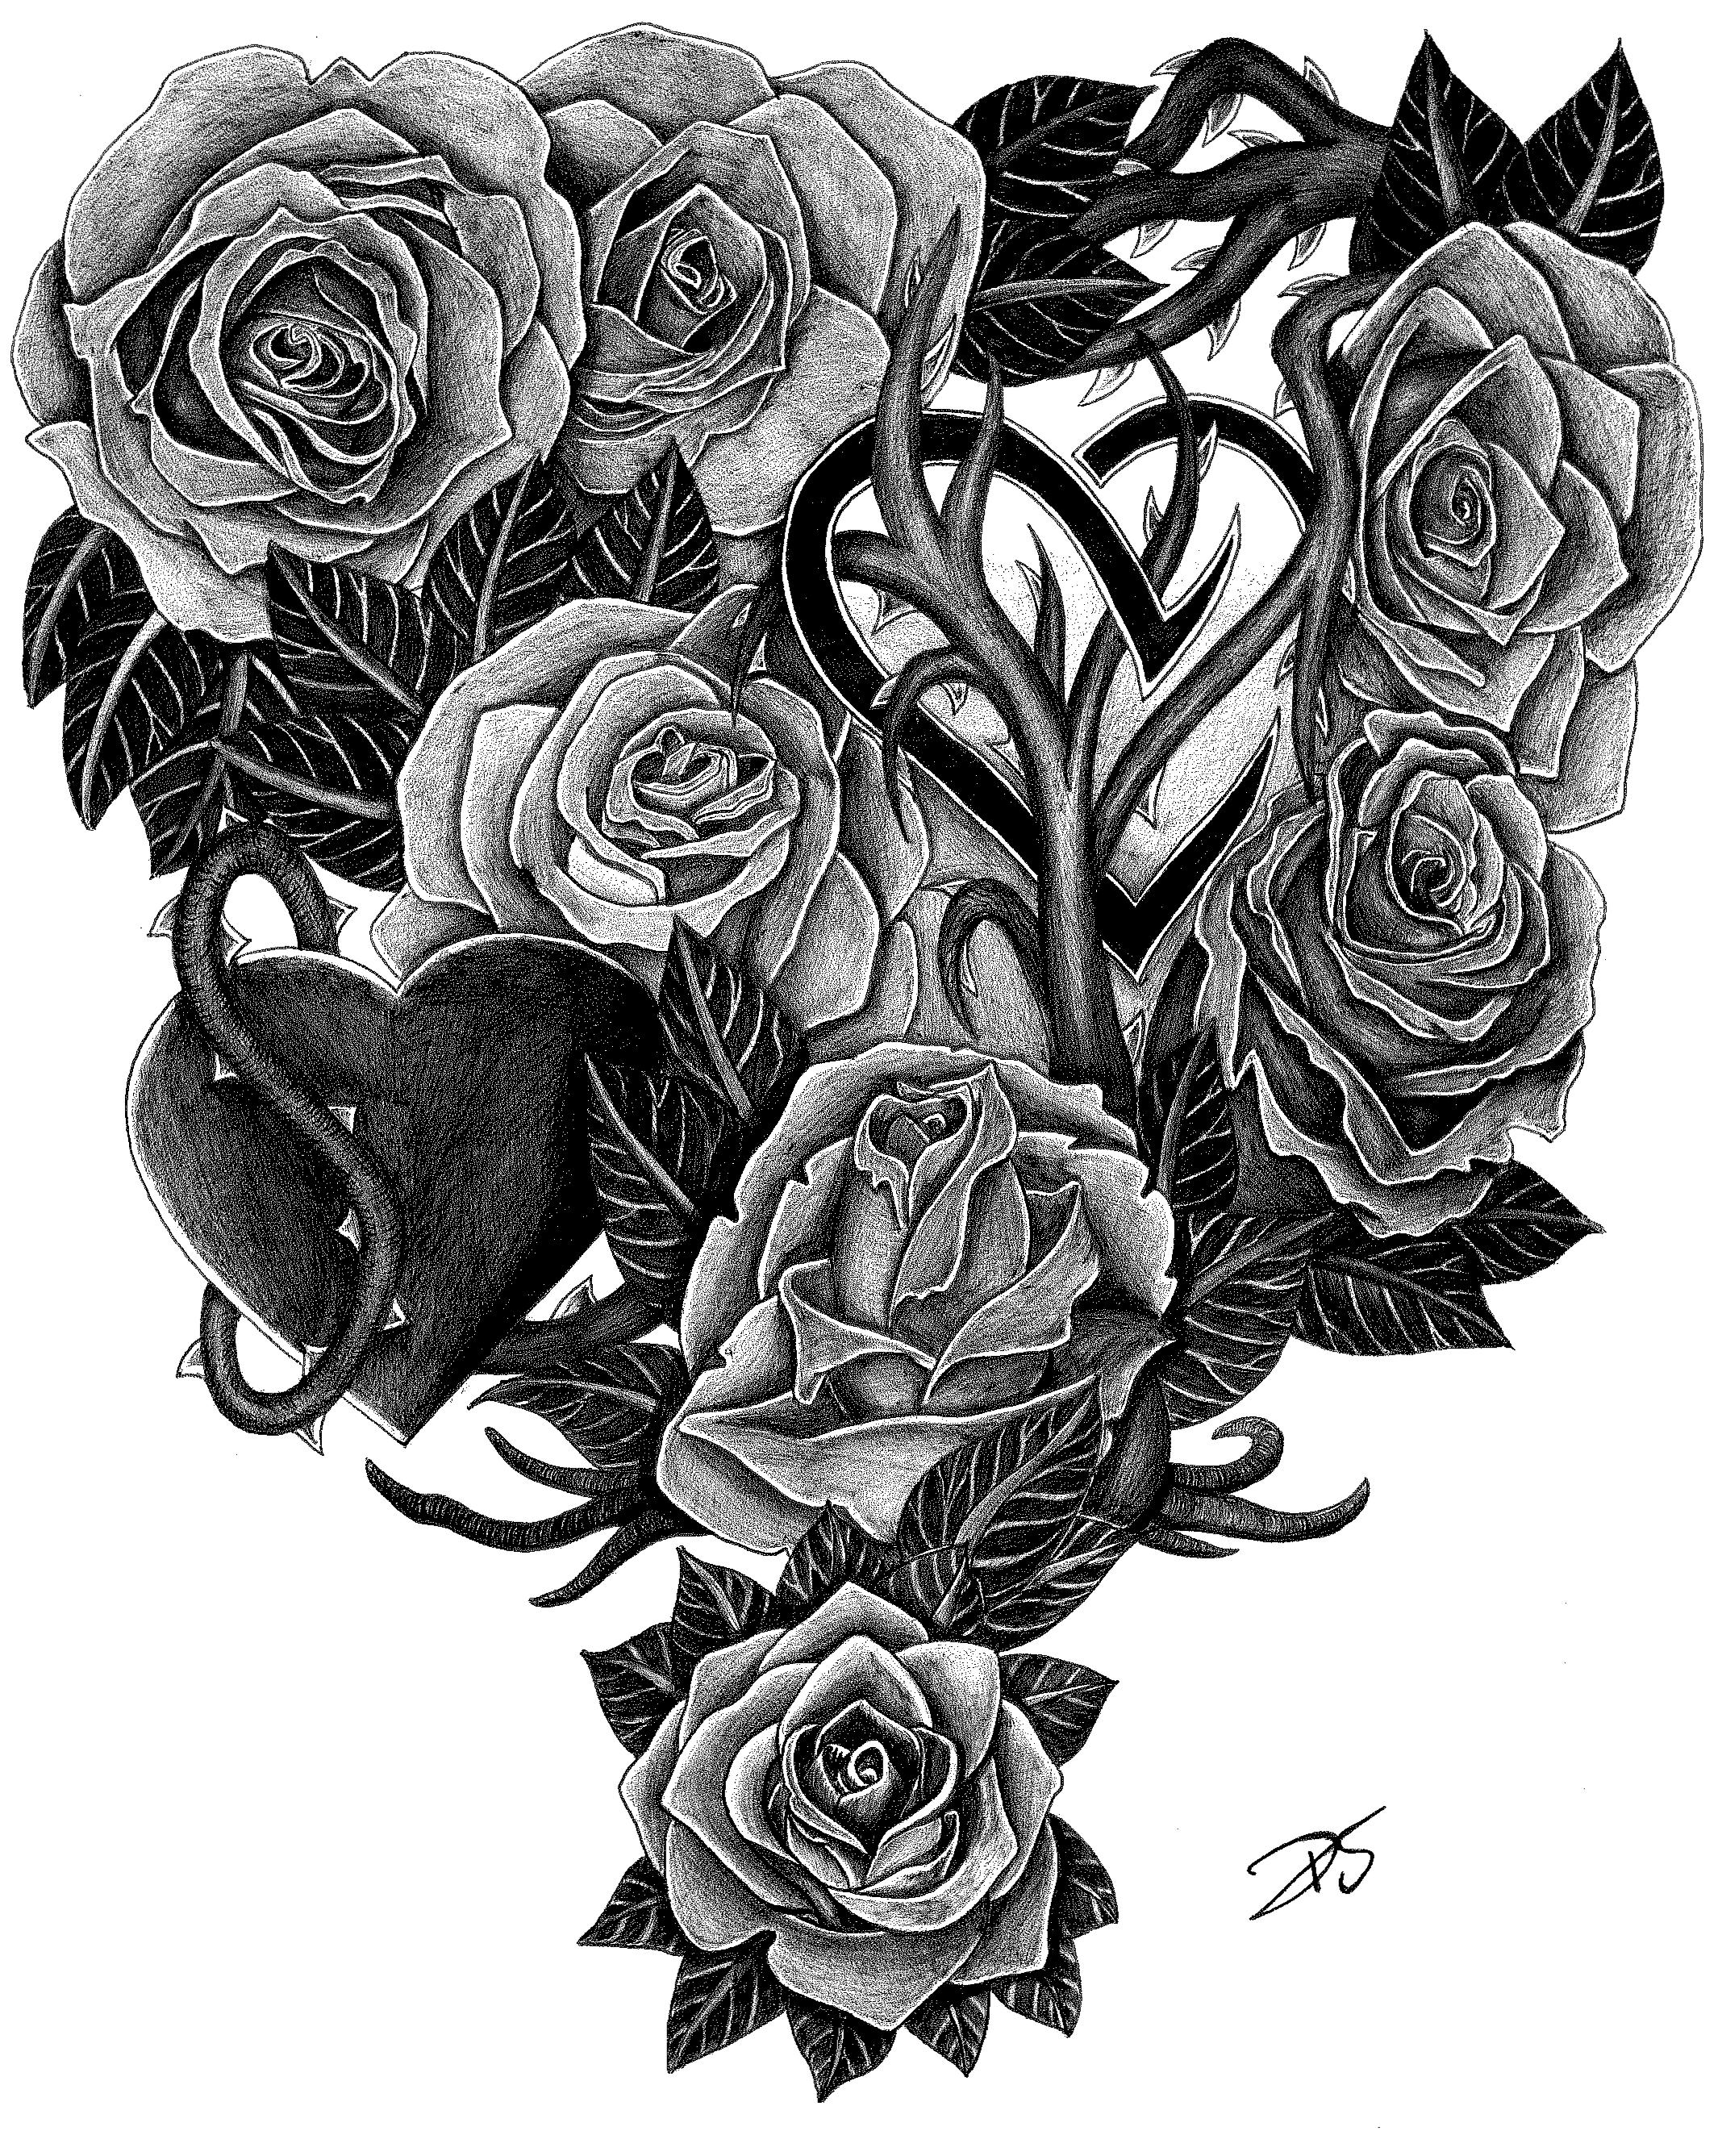 roses and hearts tattoo design by davidsteeleartworks on deviantart. Black Bedroom Furniture Sets. Home Design Ideas